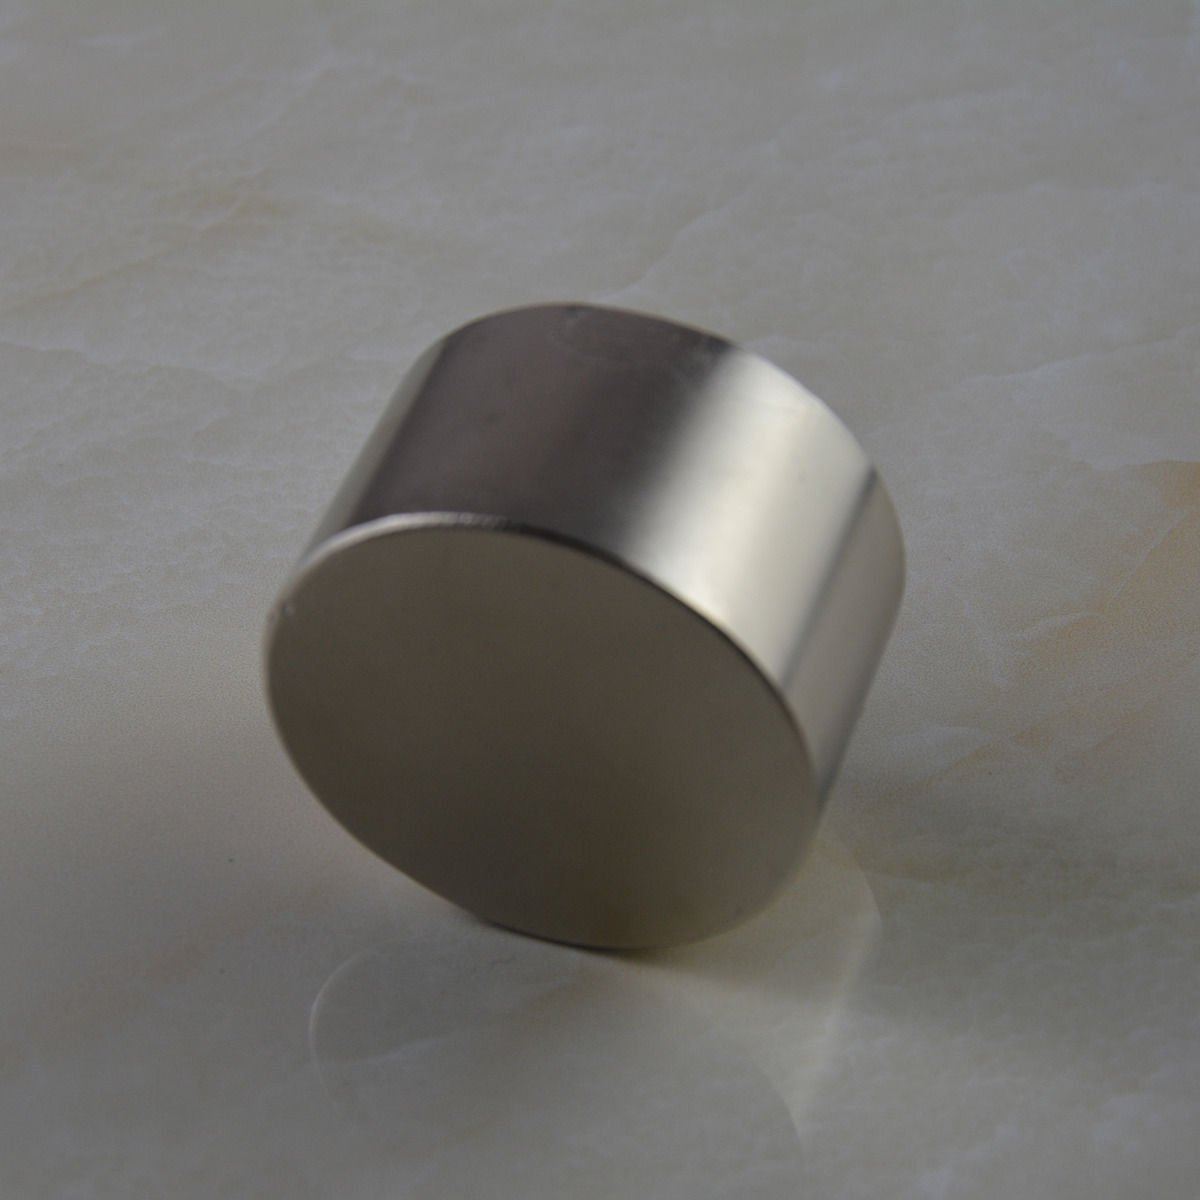 AOMAG 350Lbs Dia 50x30mm Super Strong Rare Earth Neodymium N52 Round Disc Cylinder Magnet 2 x 1.18'' (+/-0.05mm)